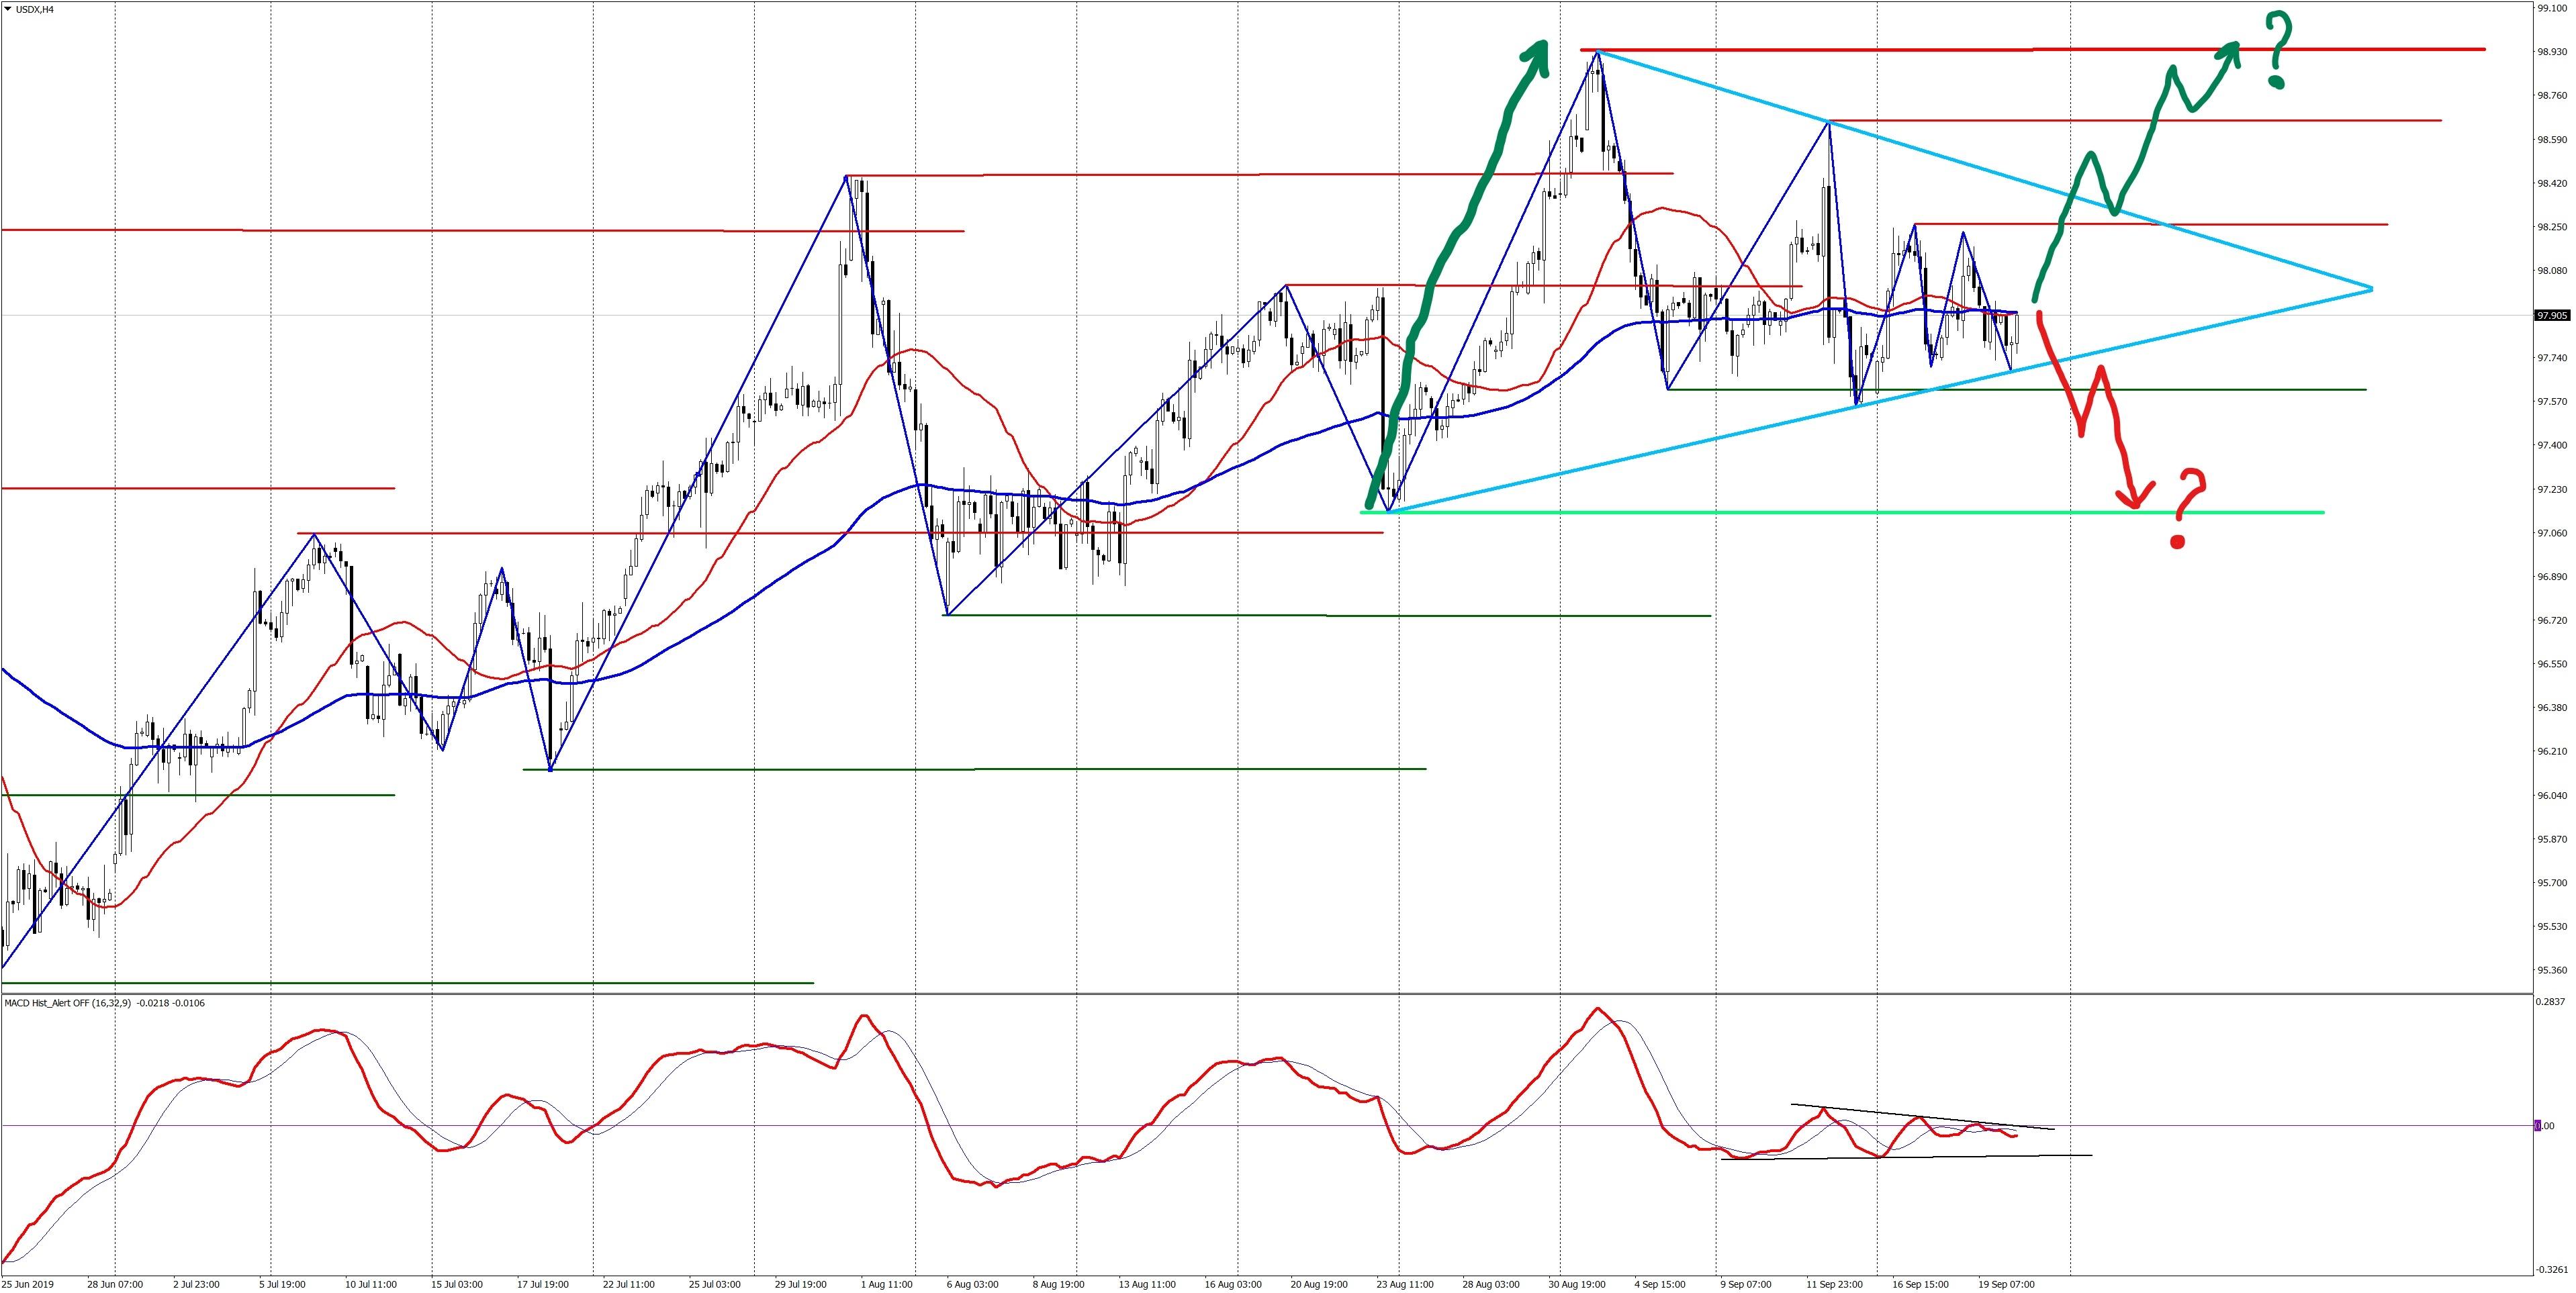 USDX consolidation